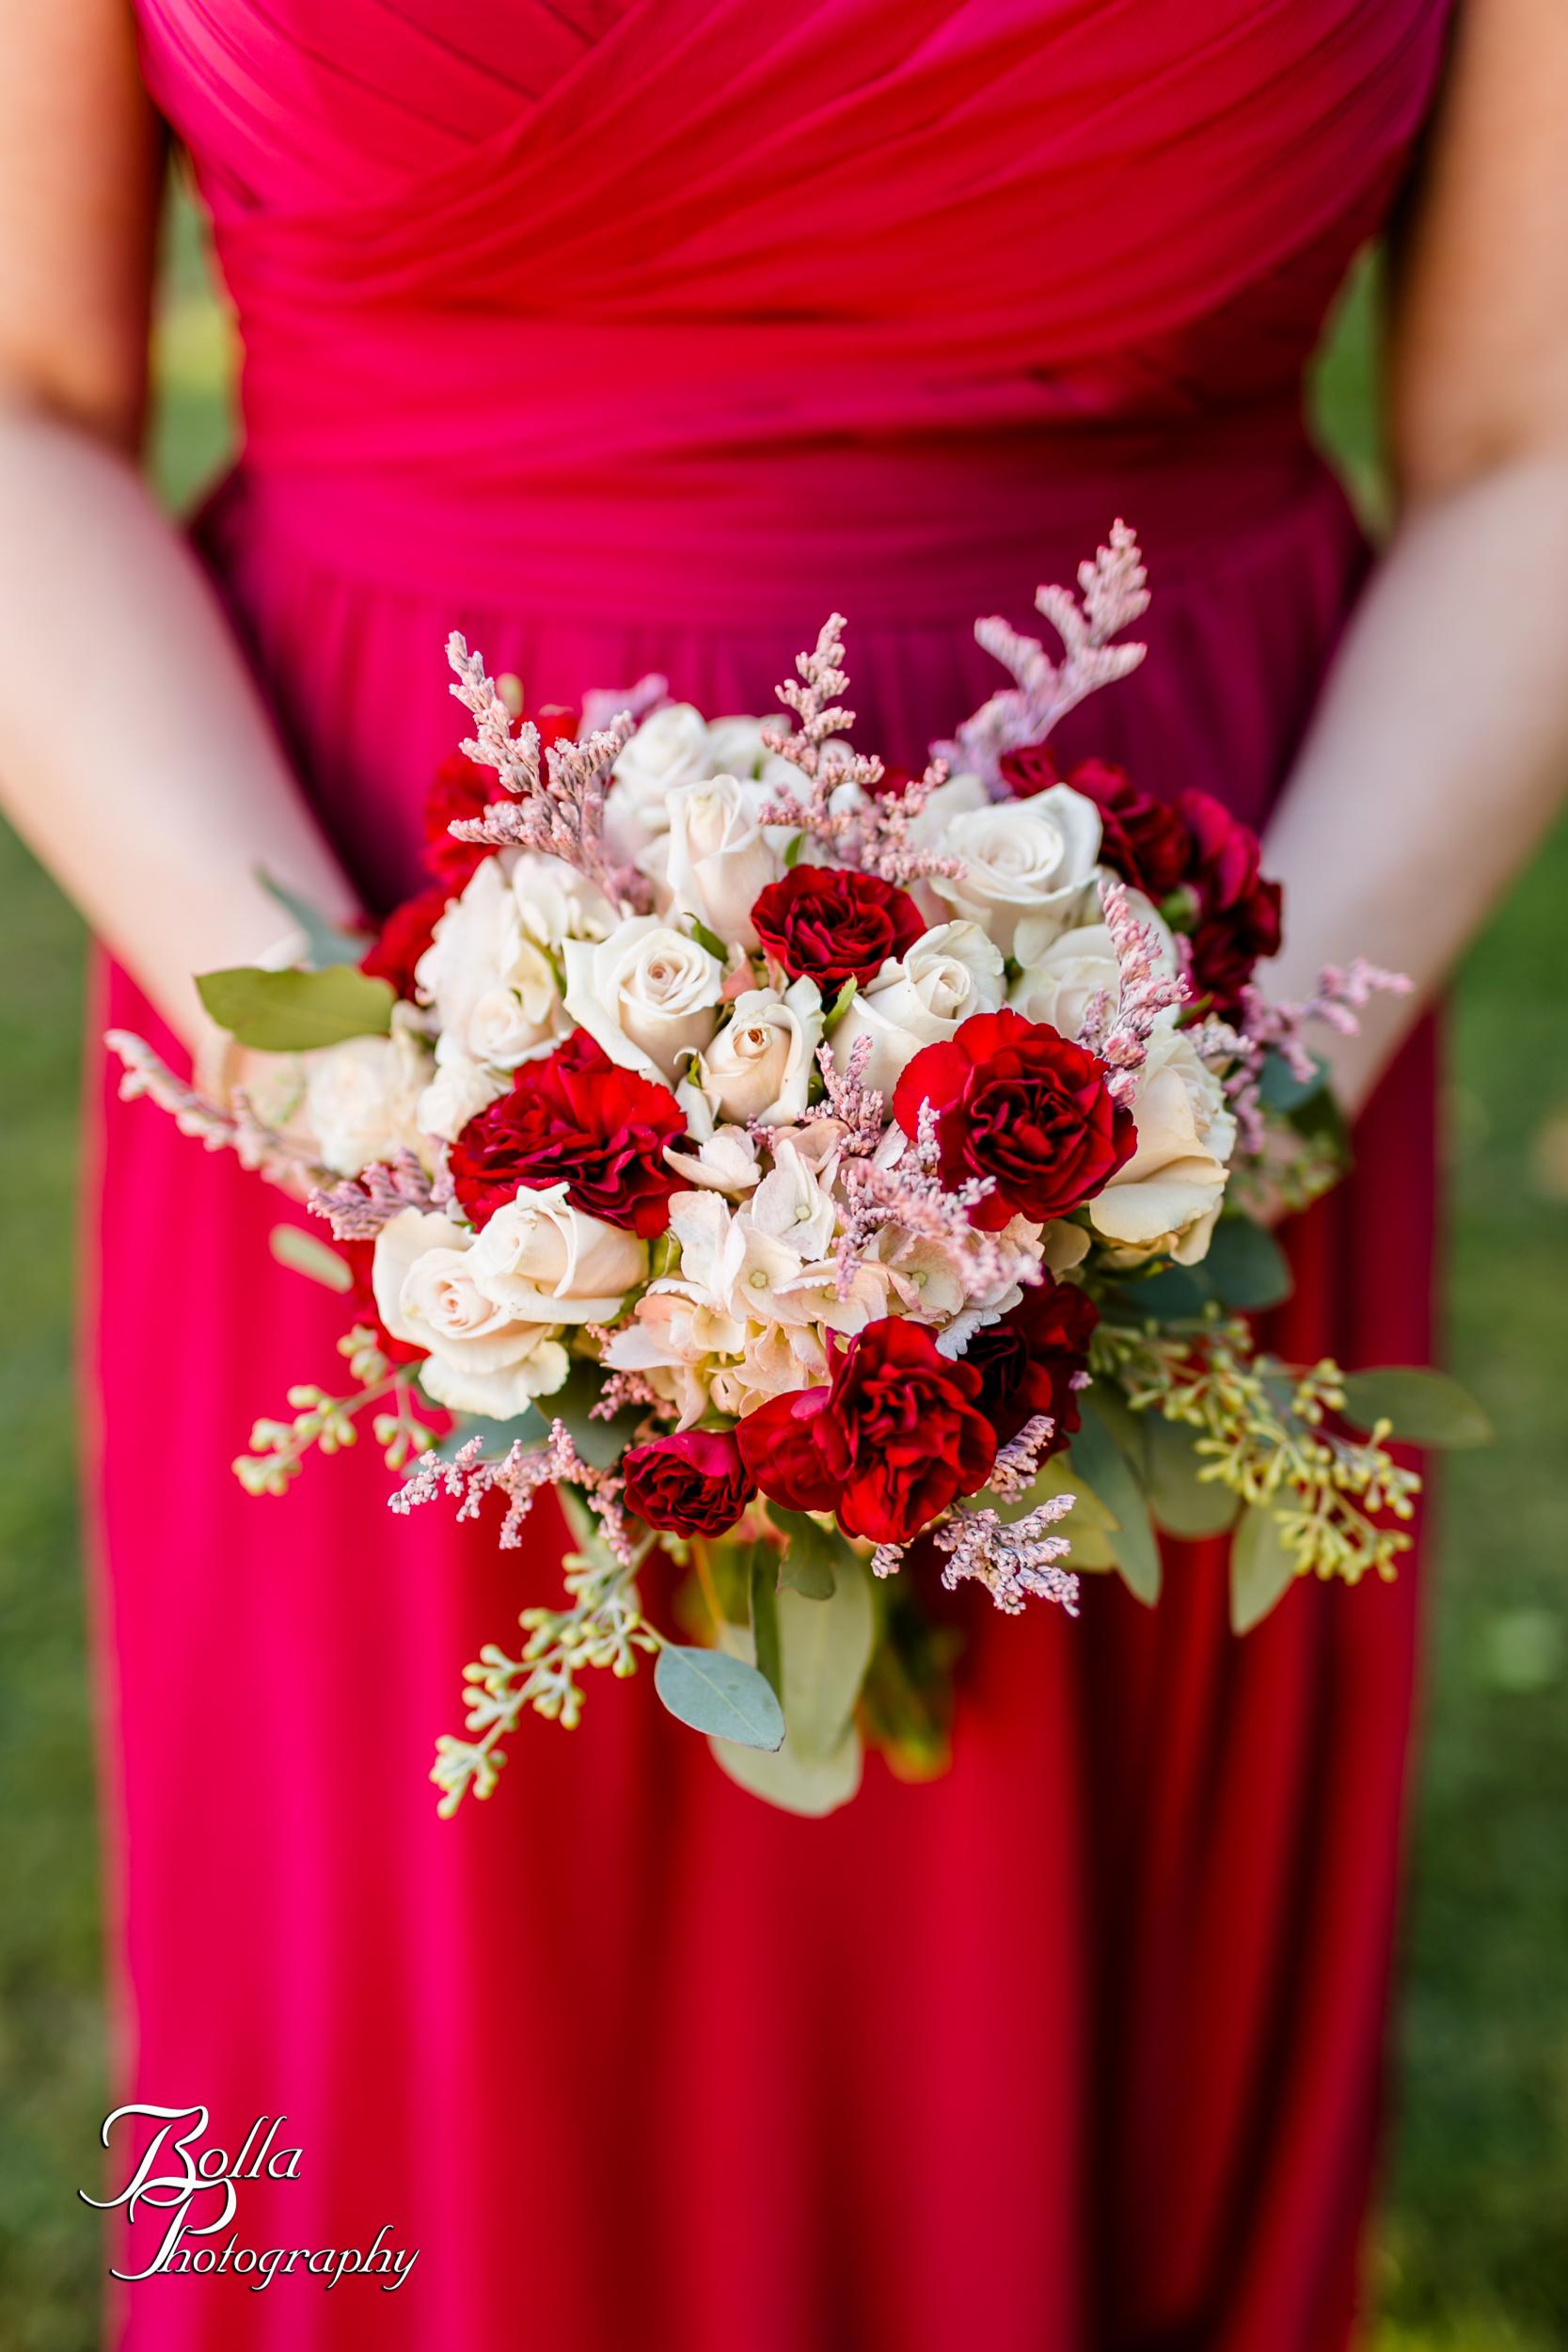 Bolla_photography_edwardsville_wedding_photographer_st_louis_weddings_Reilmann-0300.jpg